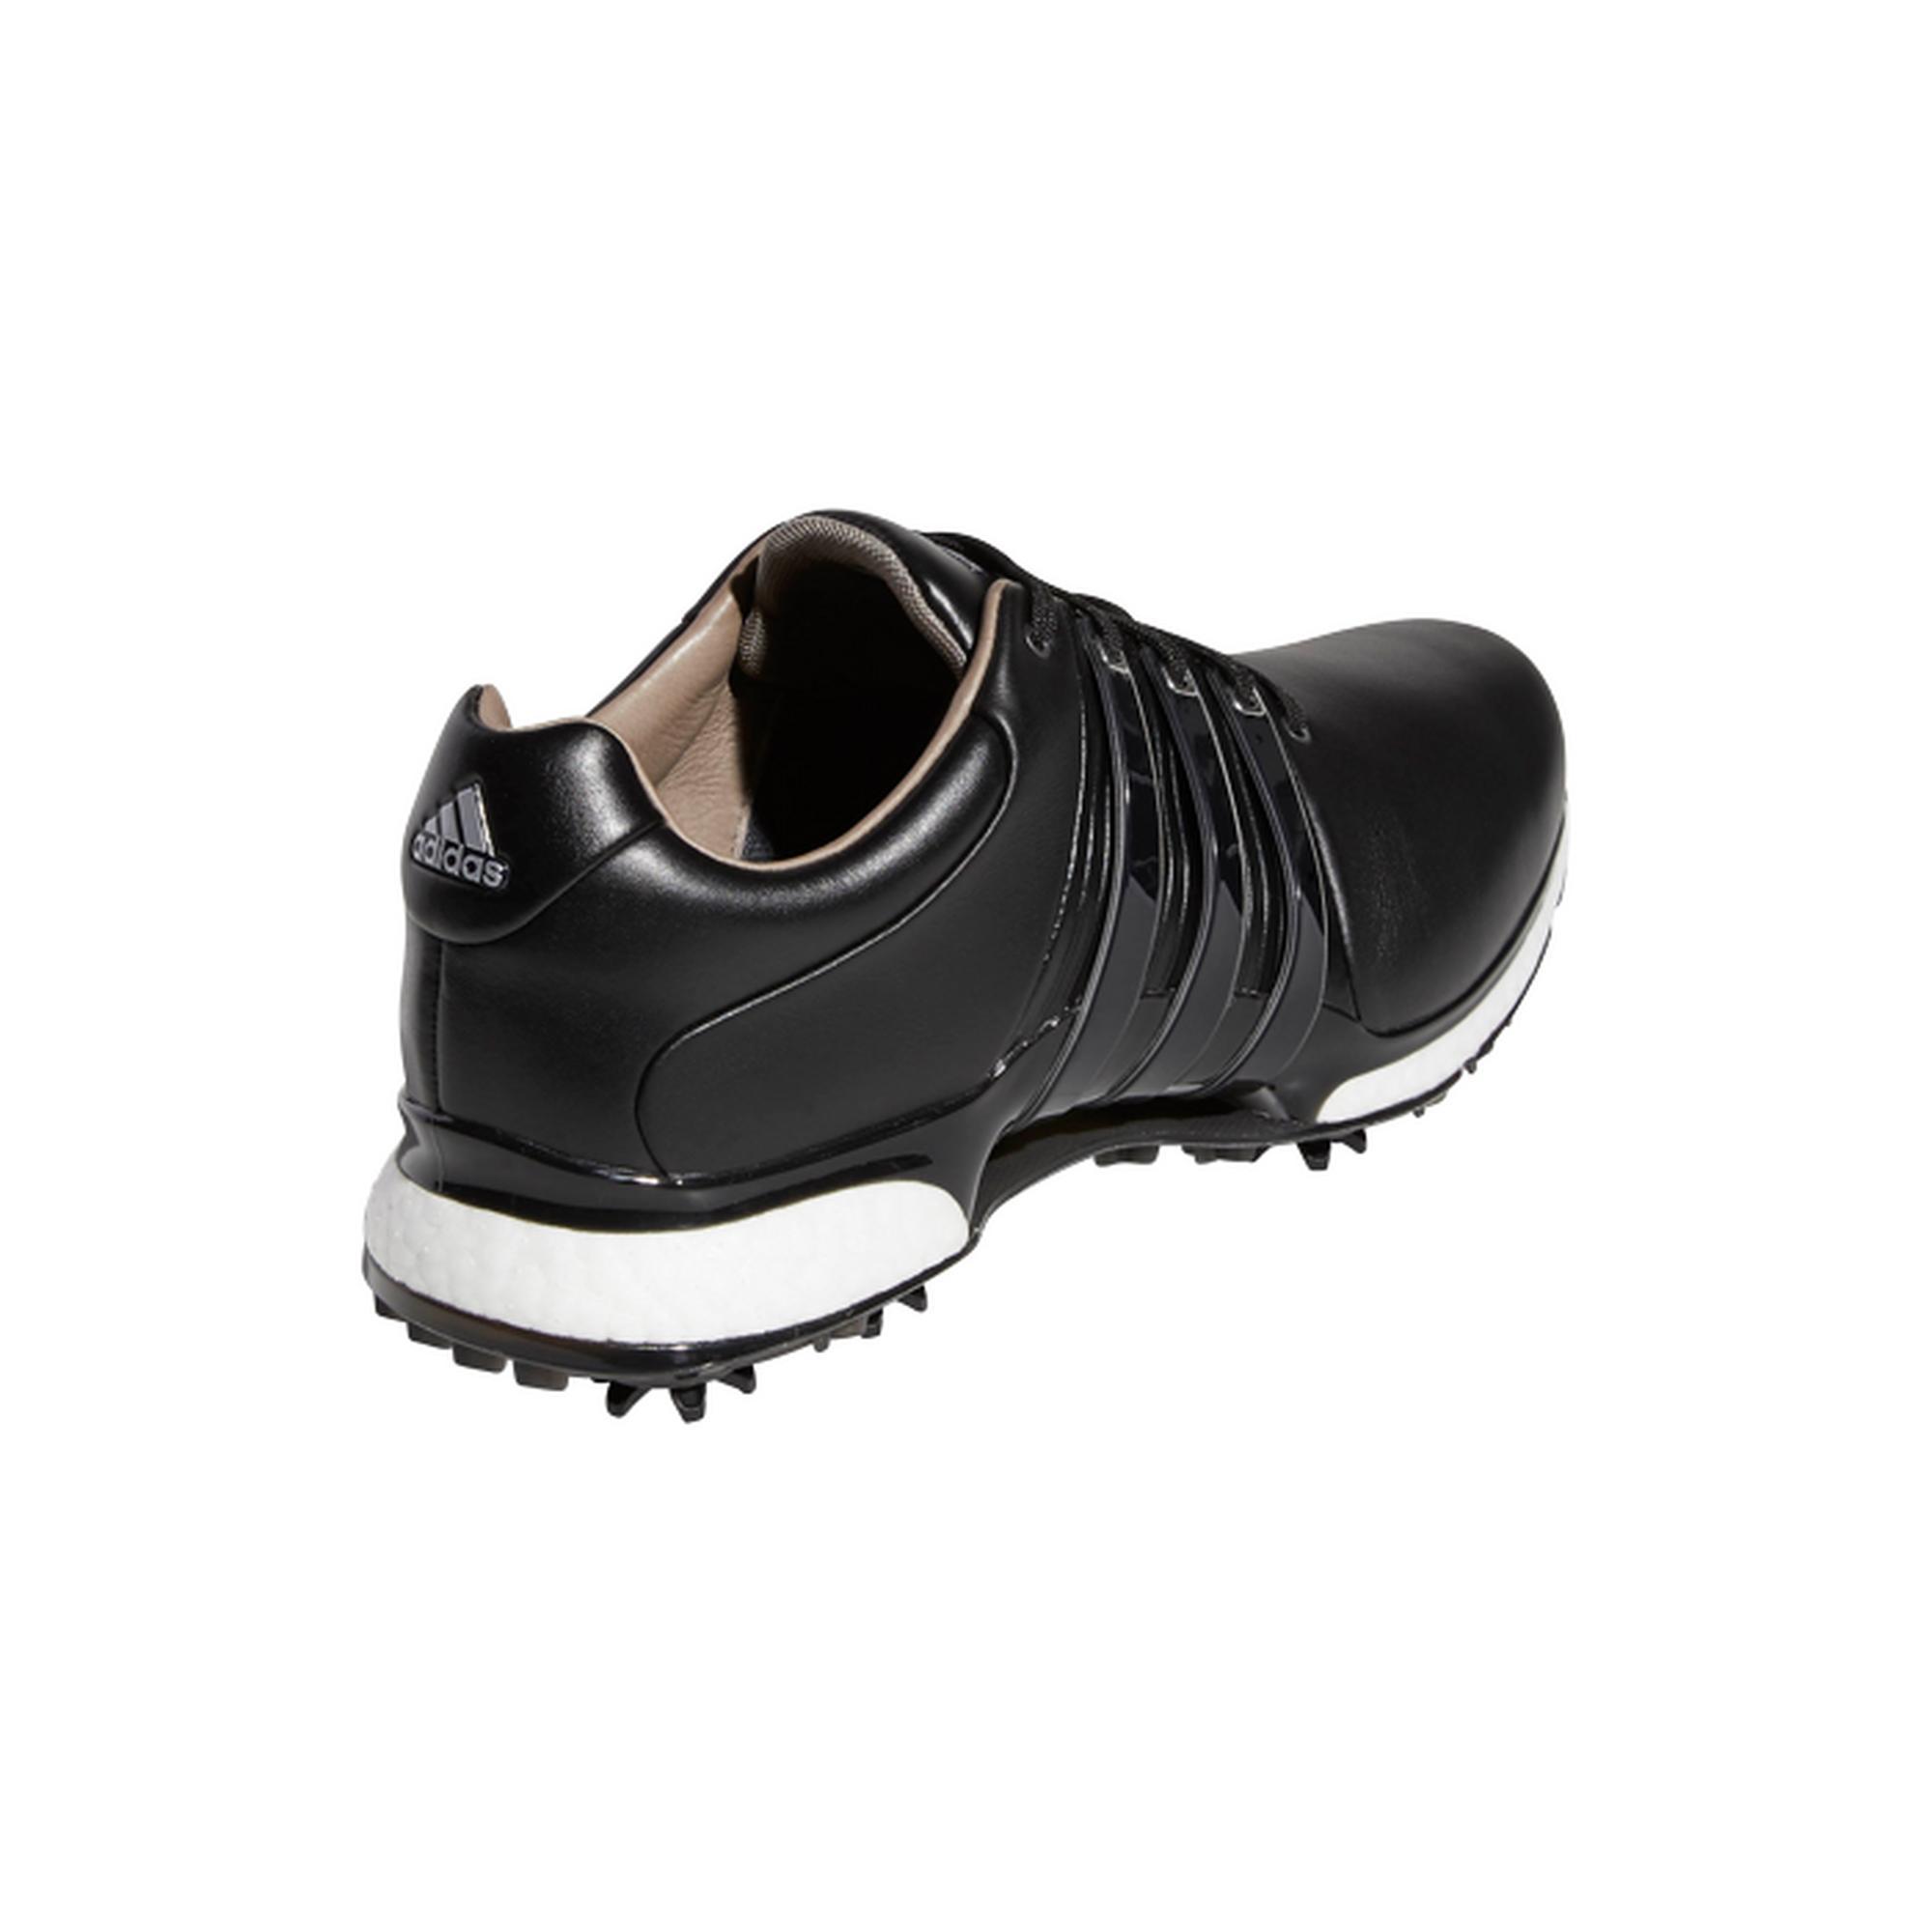 Men's Tour360 XT Spiked Golf Shoe - BLACK/WHITE/SILVER